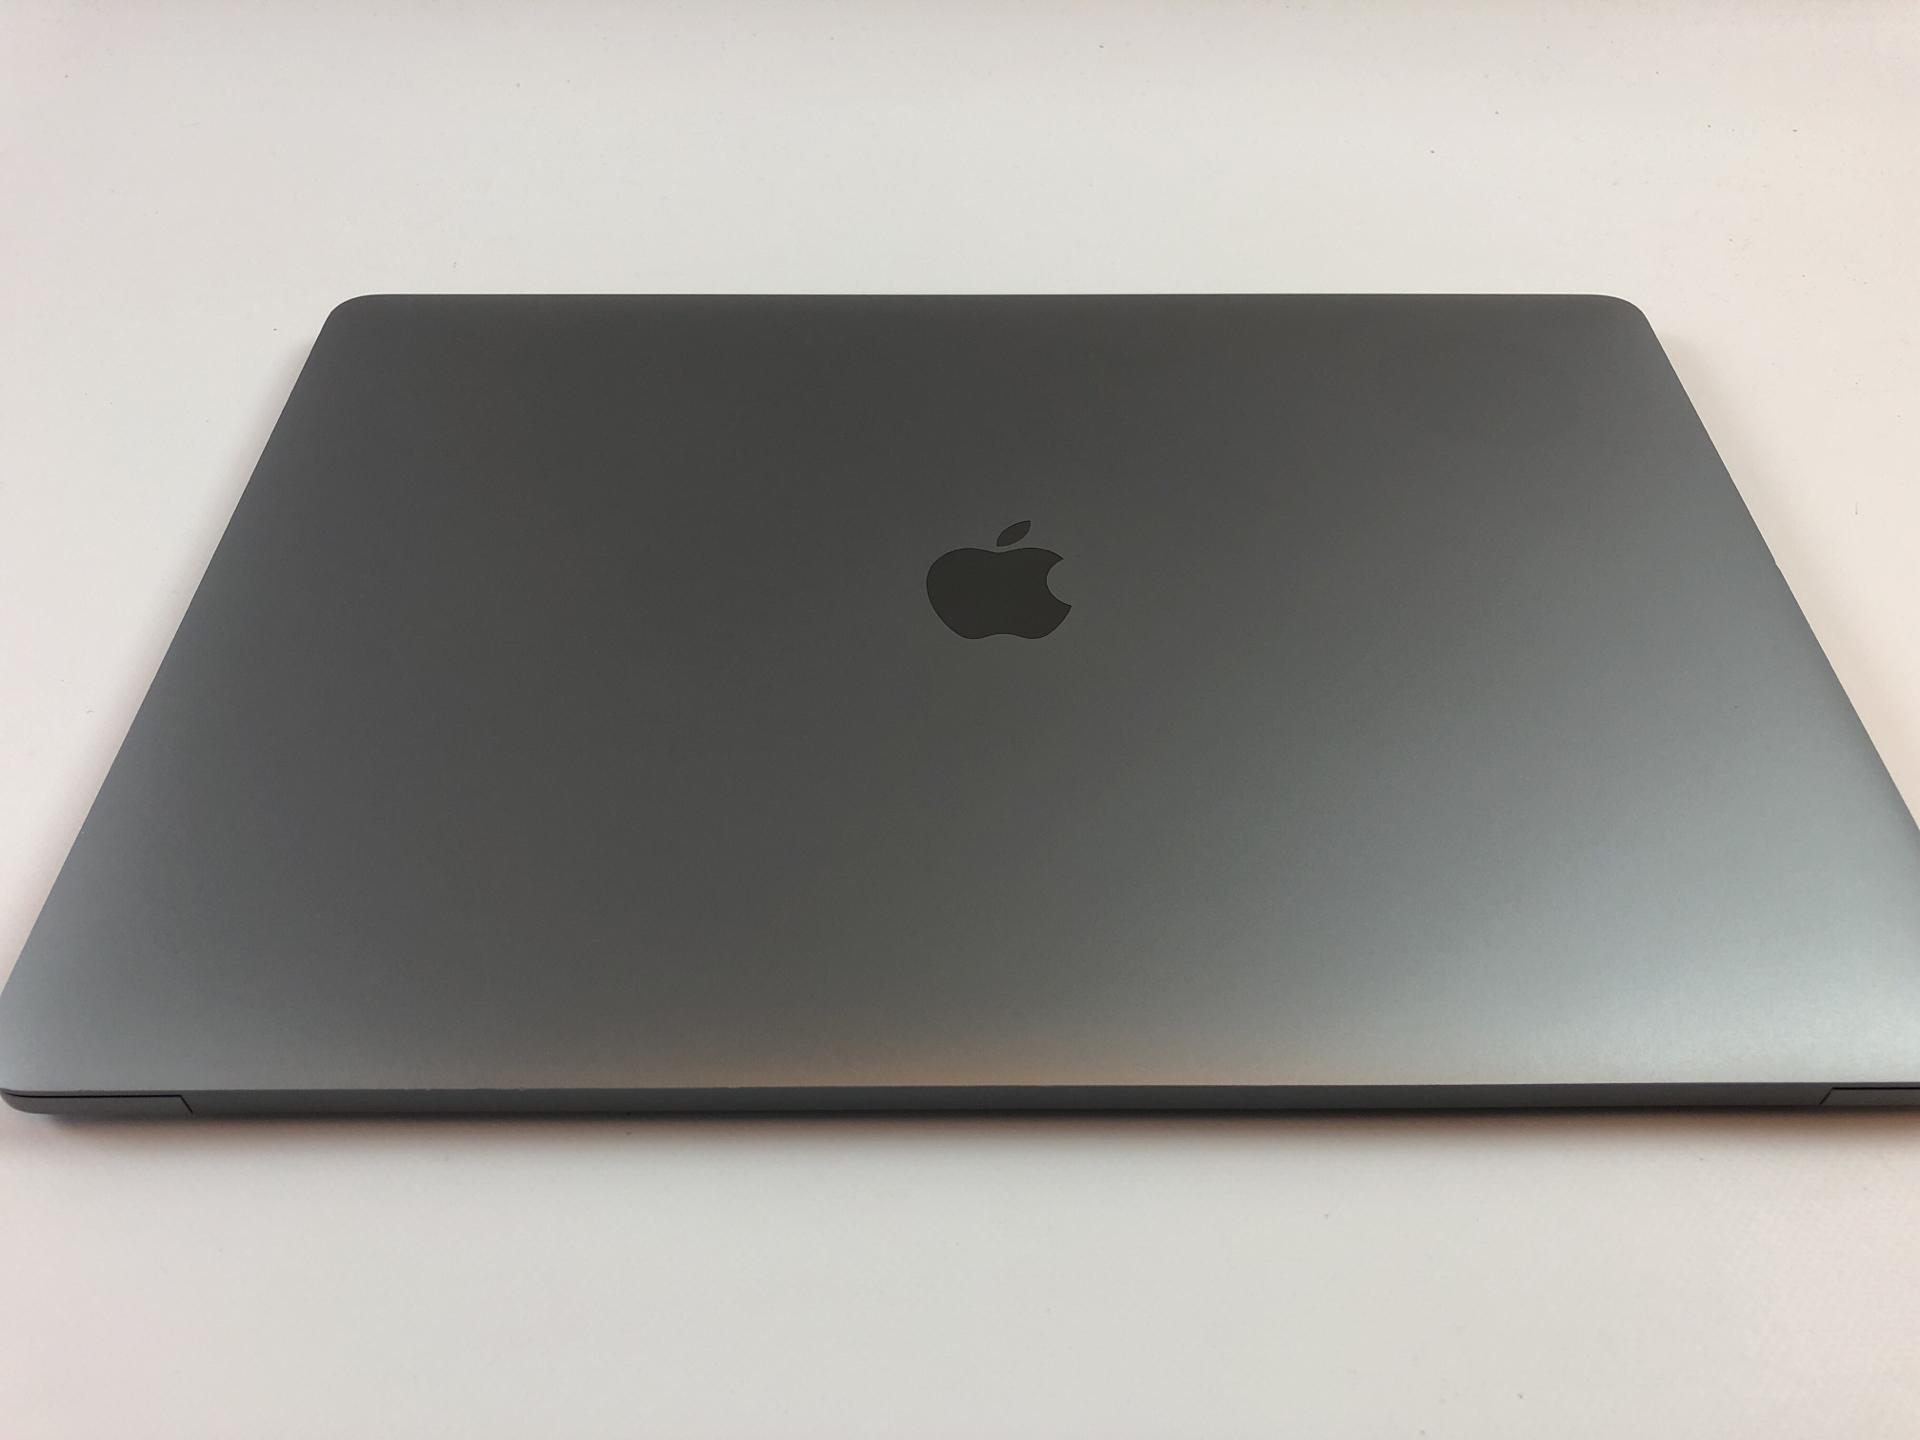 "MacBook Pro 15"" Touch Bar Late 2016 (Intel Quad-Core i7 2.6 GHz 16 GB RAM 512 GB SSD), Space Gray, Intel Quad-Core i7 2.6 GHz, 16 GB RAM, 512 GB SSD, Kuva 2"